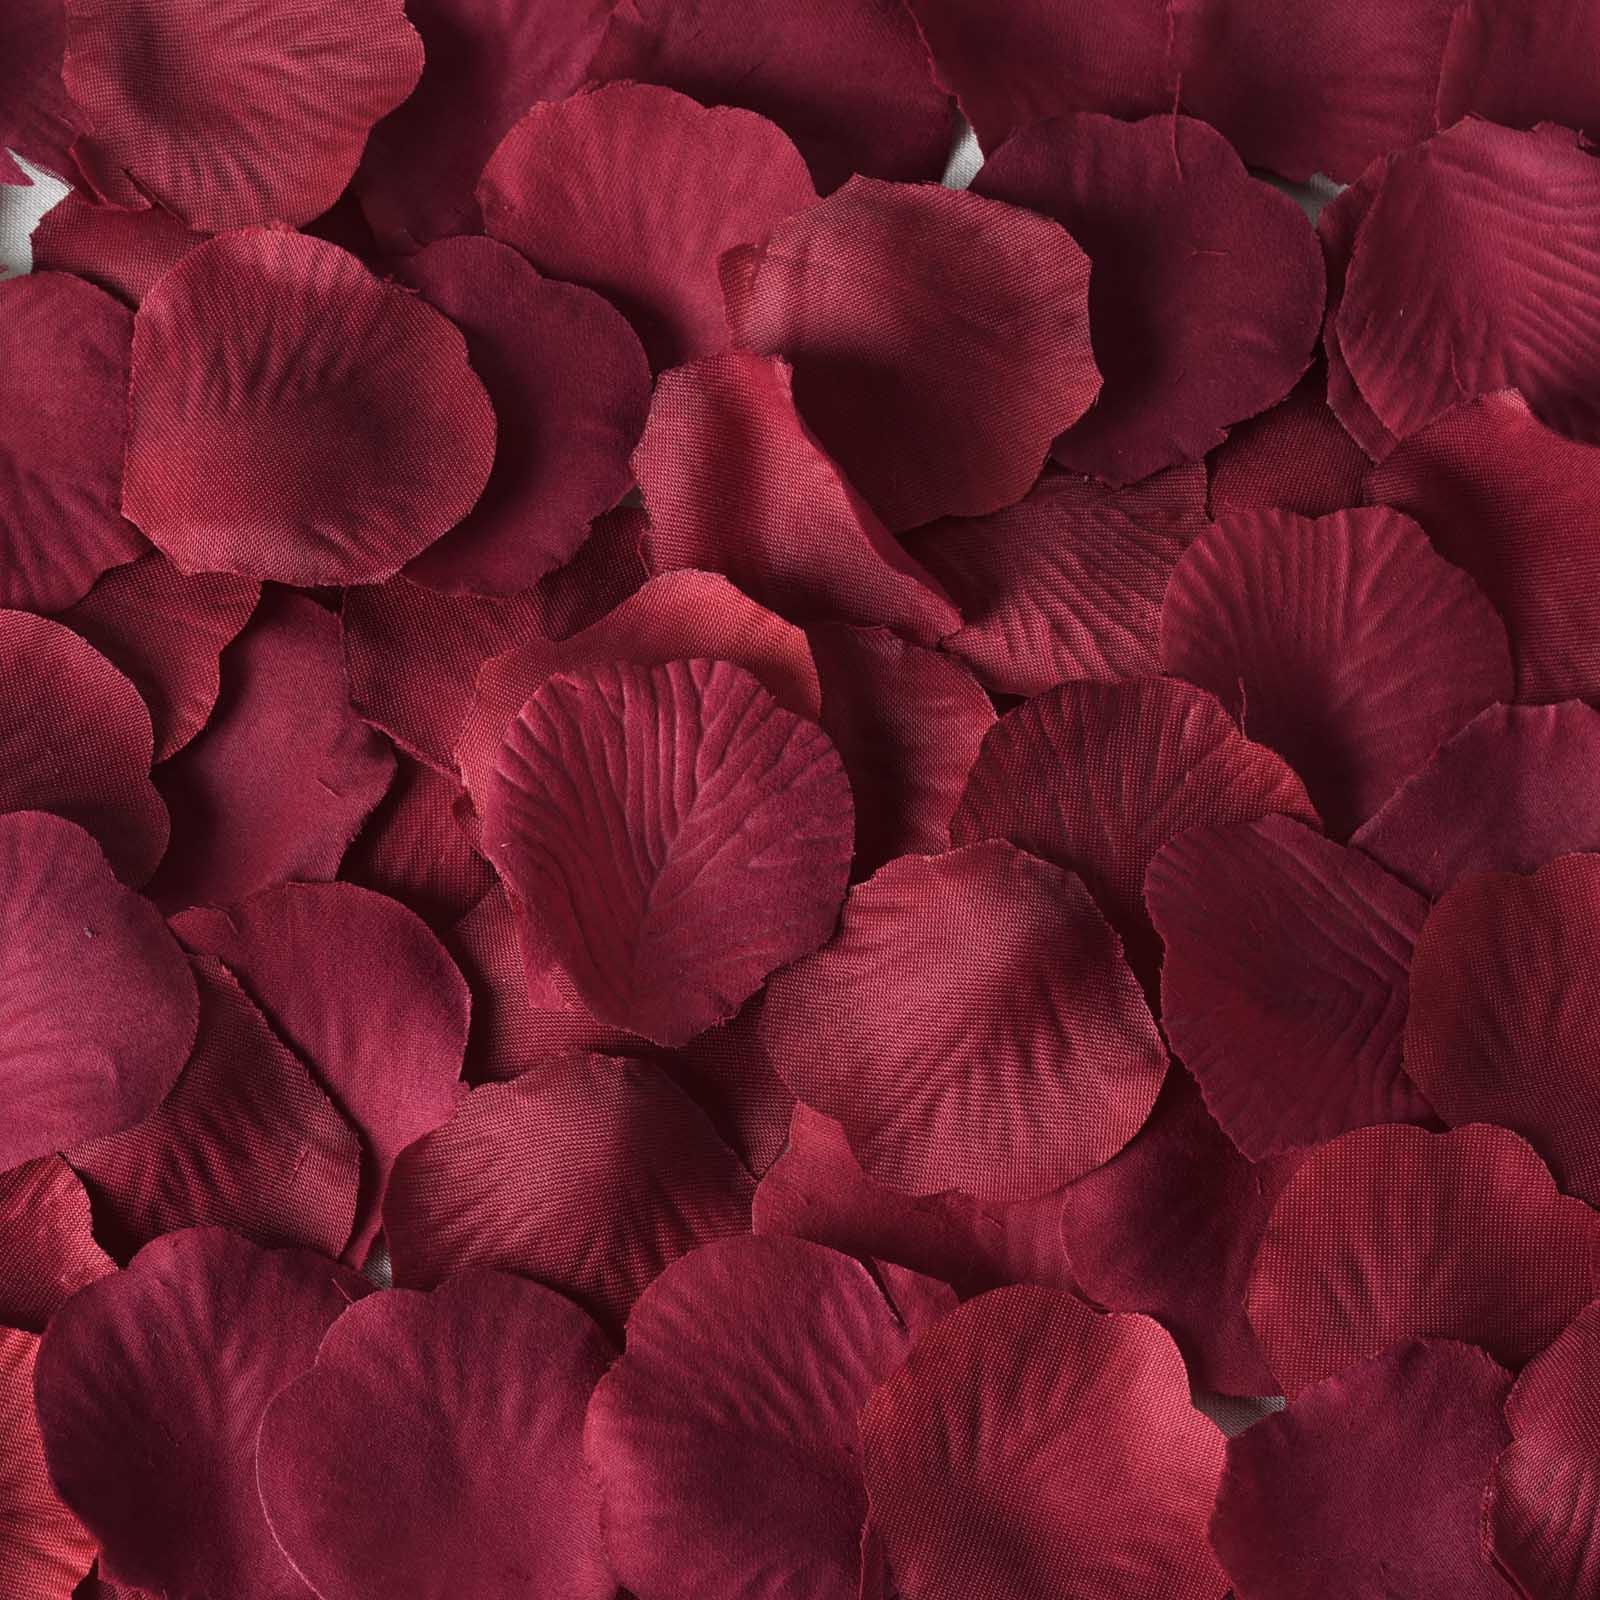 Garden Roses Flower Petal: 3000 Silk ROSE PETALS Wedding Cheap Wholesale Decorations